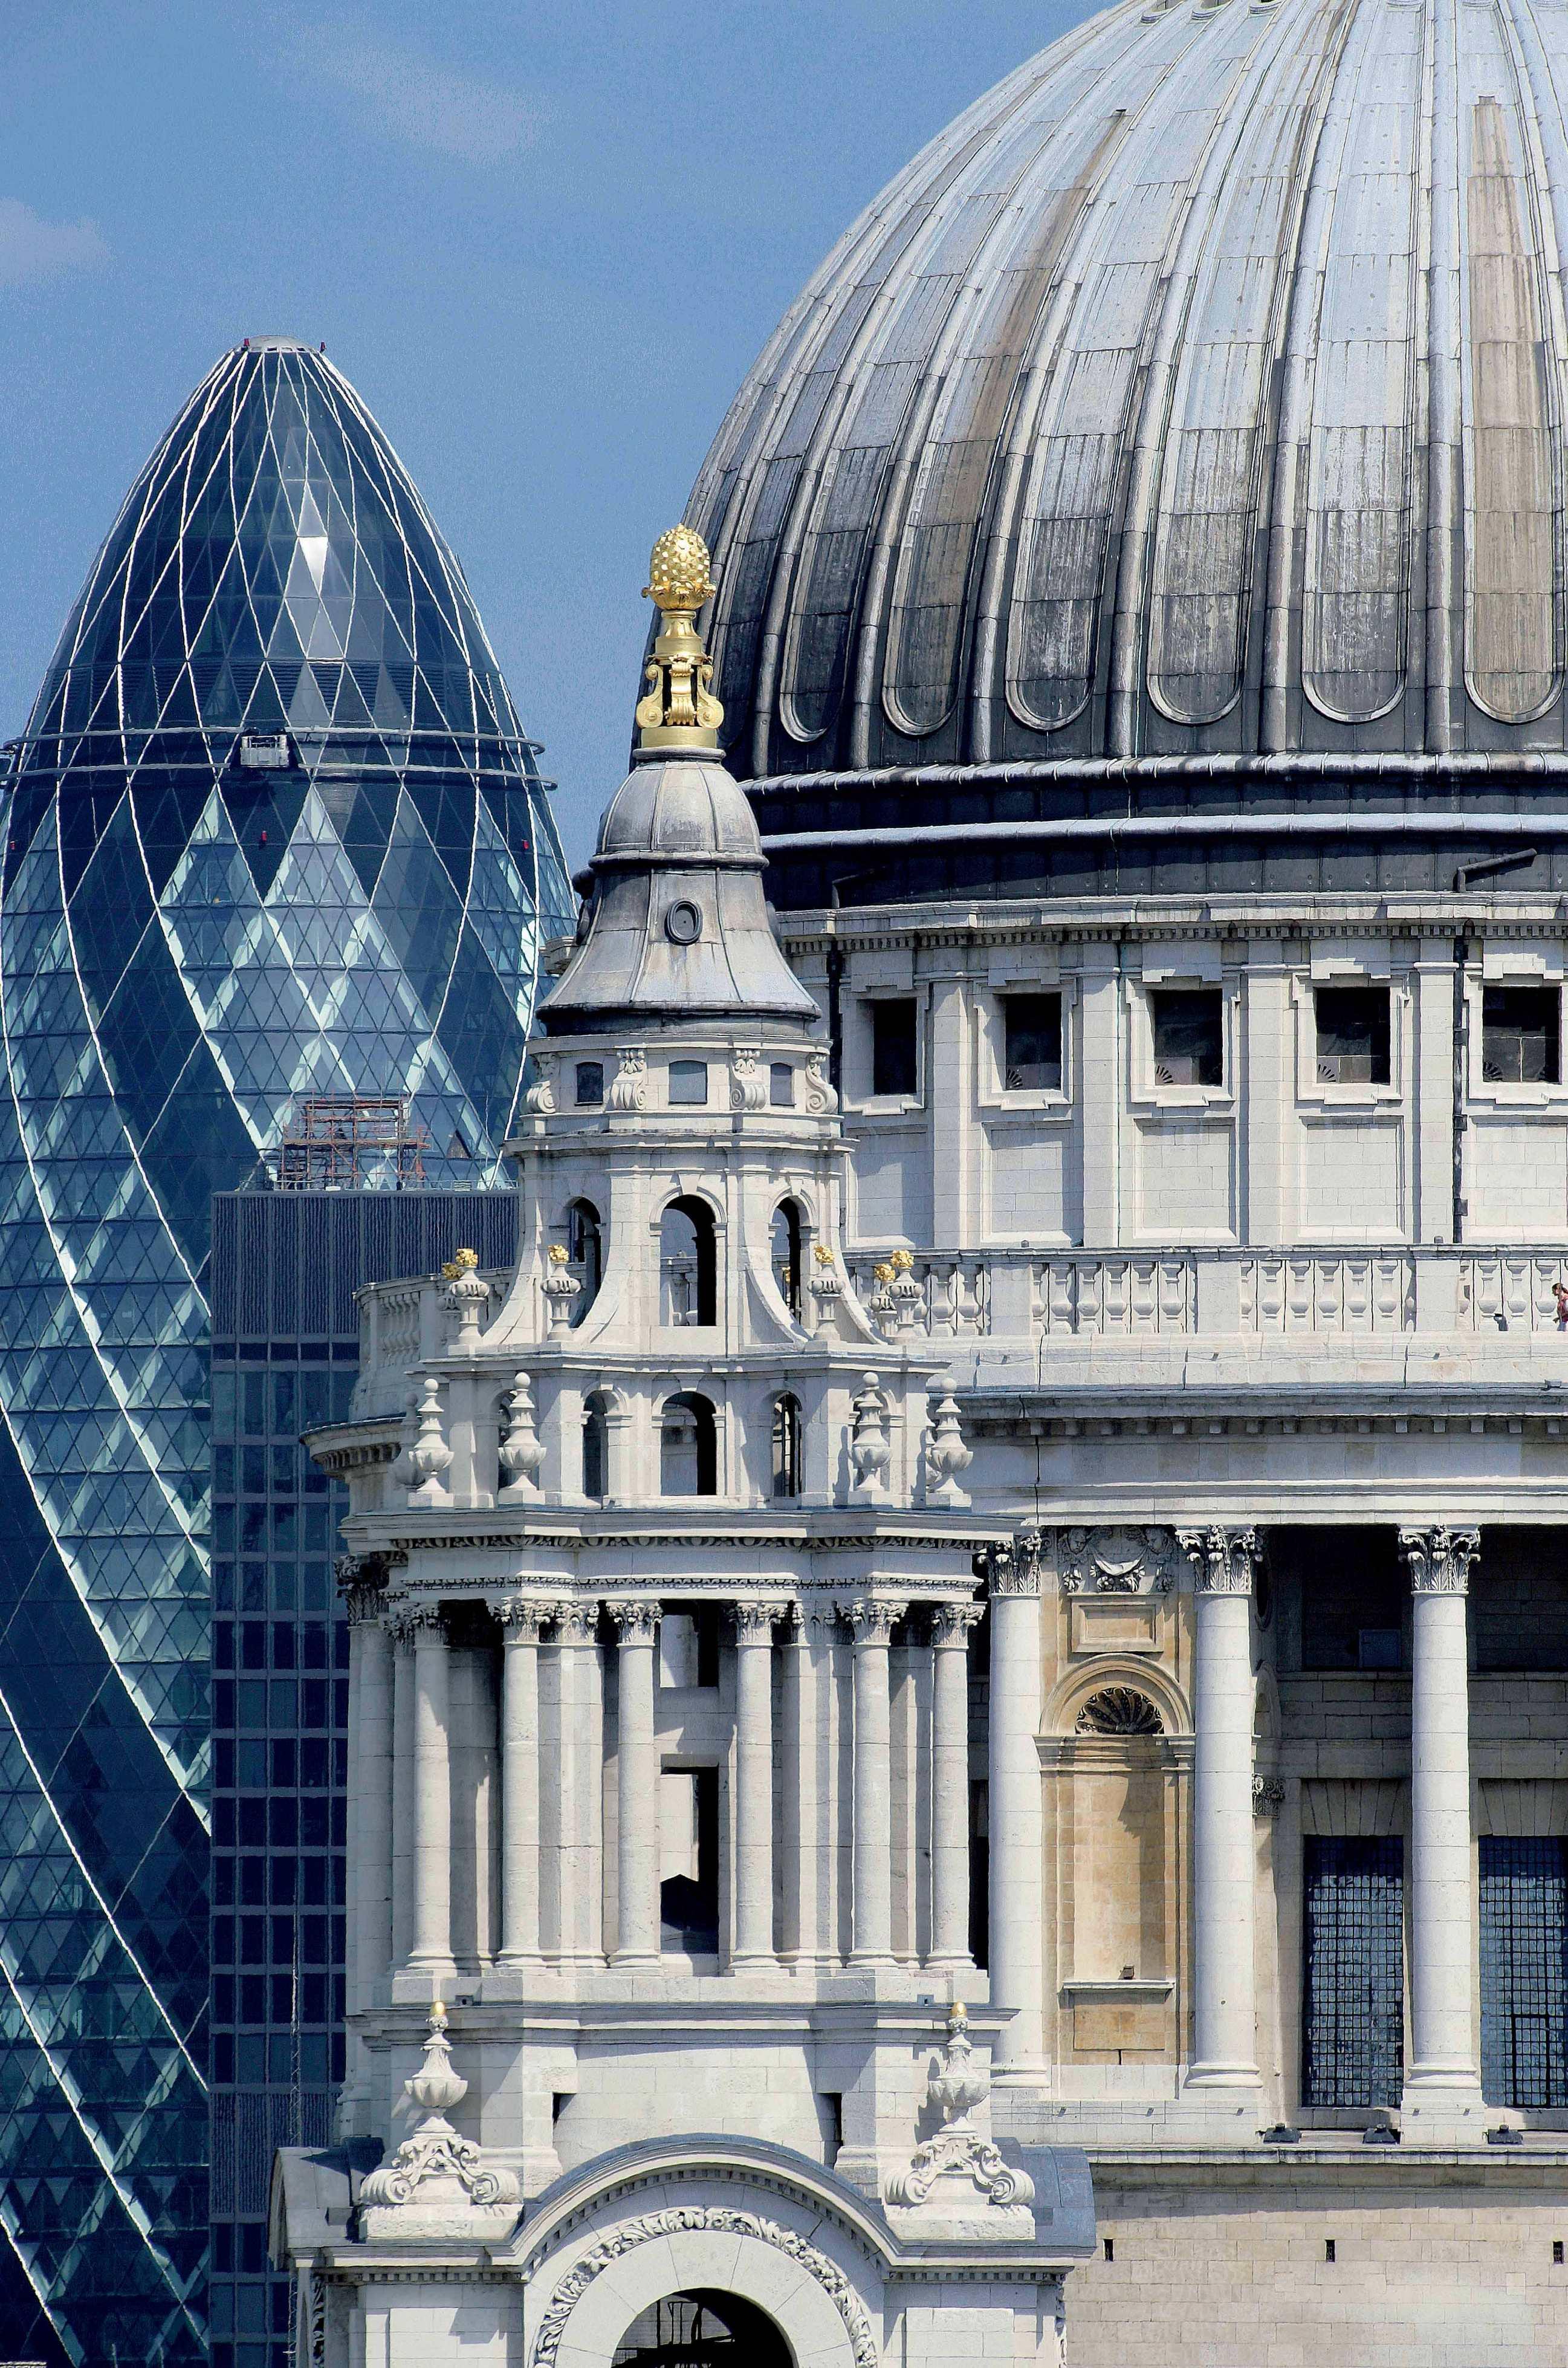 london architecture building travel city dome sky religion tourism landmark urban